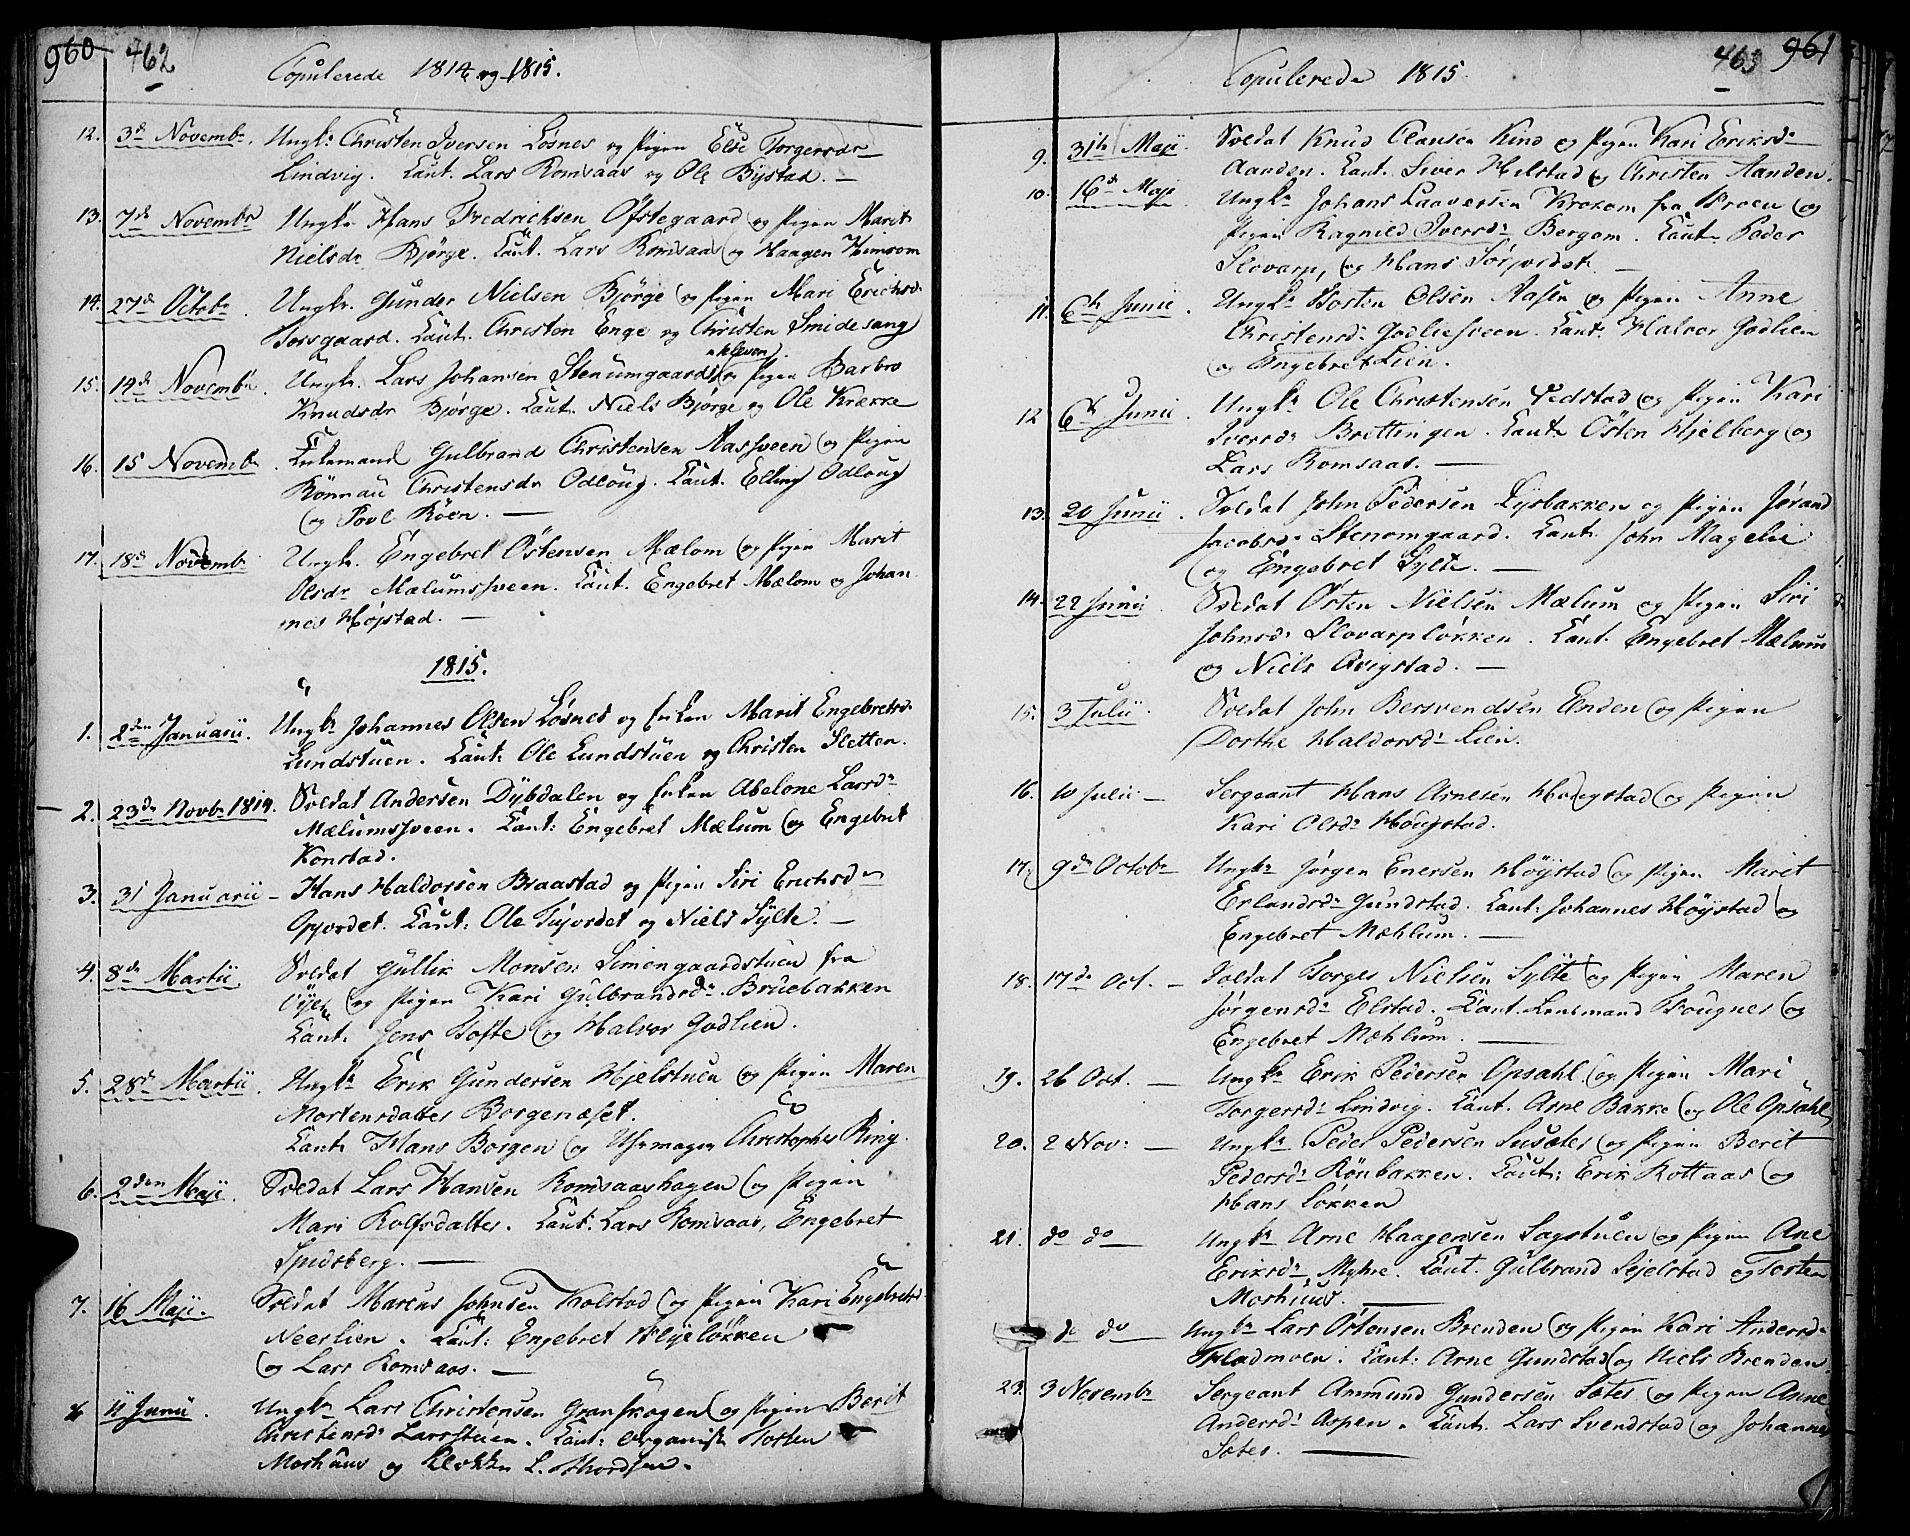 SAH, Ringebu prestekontor, Ministerialbok nr. 3, 1781-1820, s. 462-463